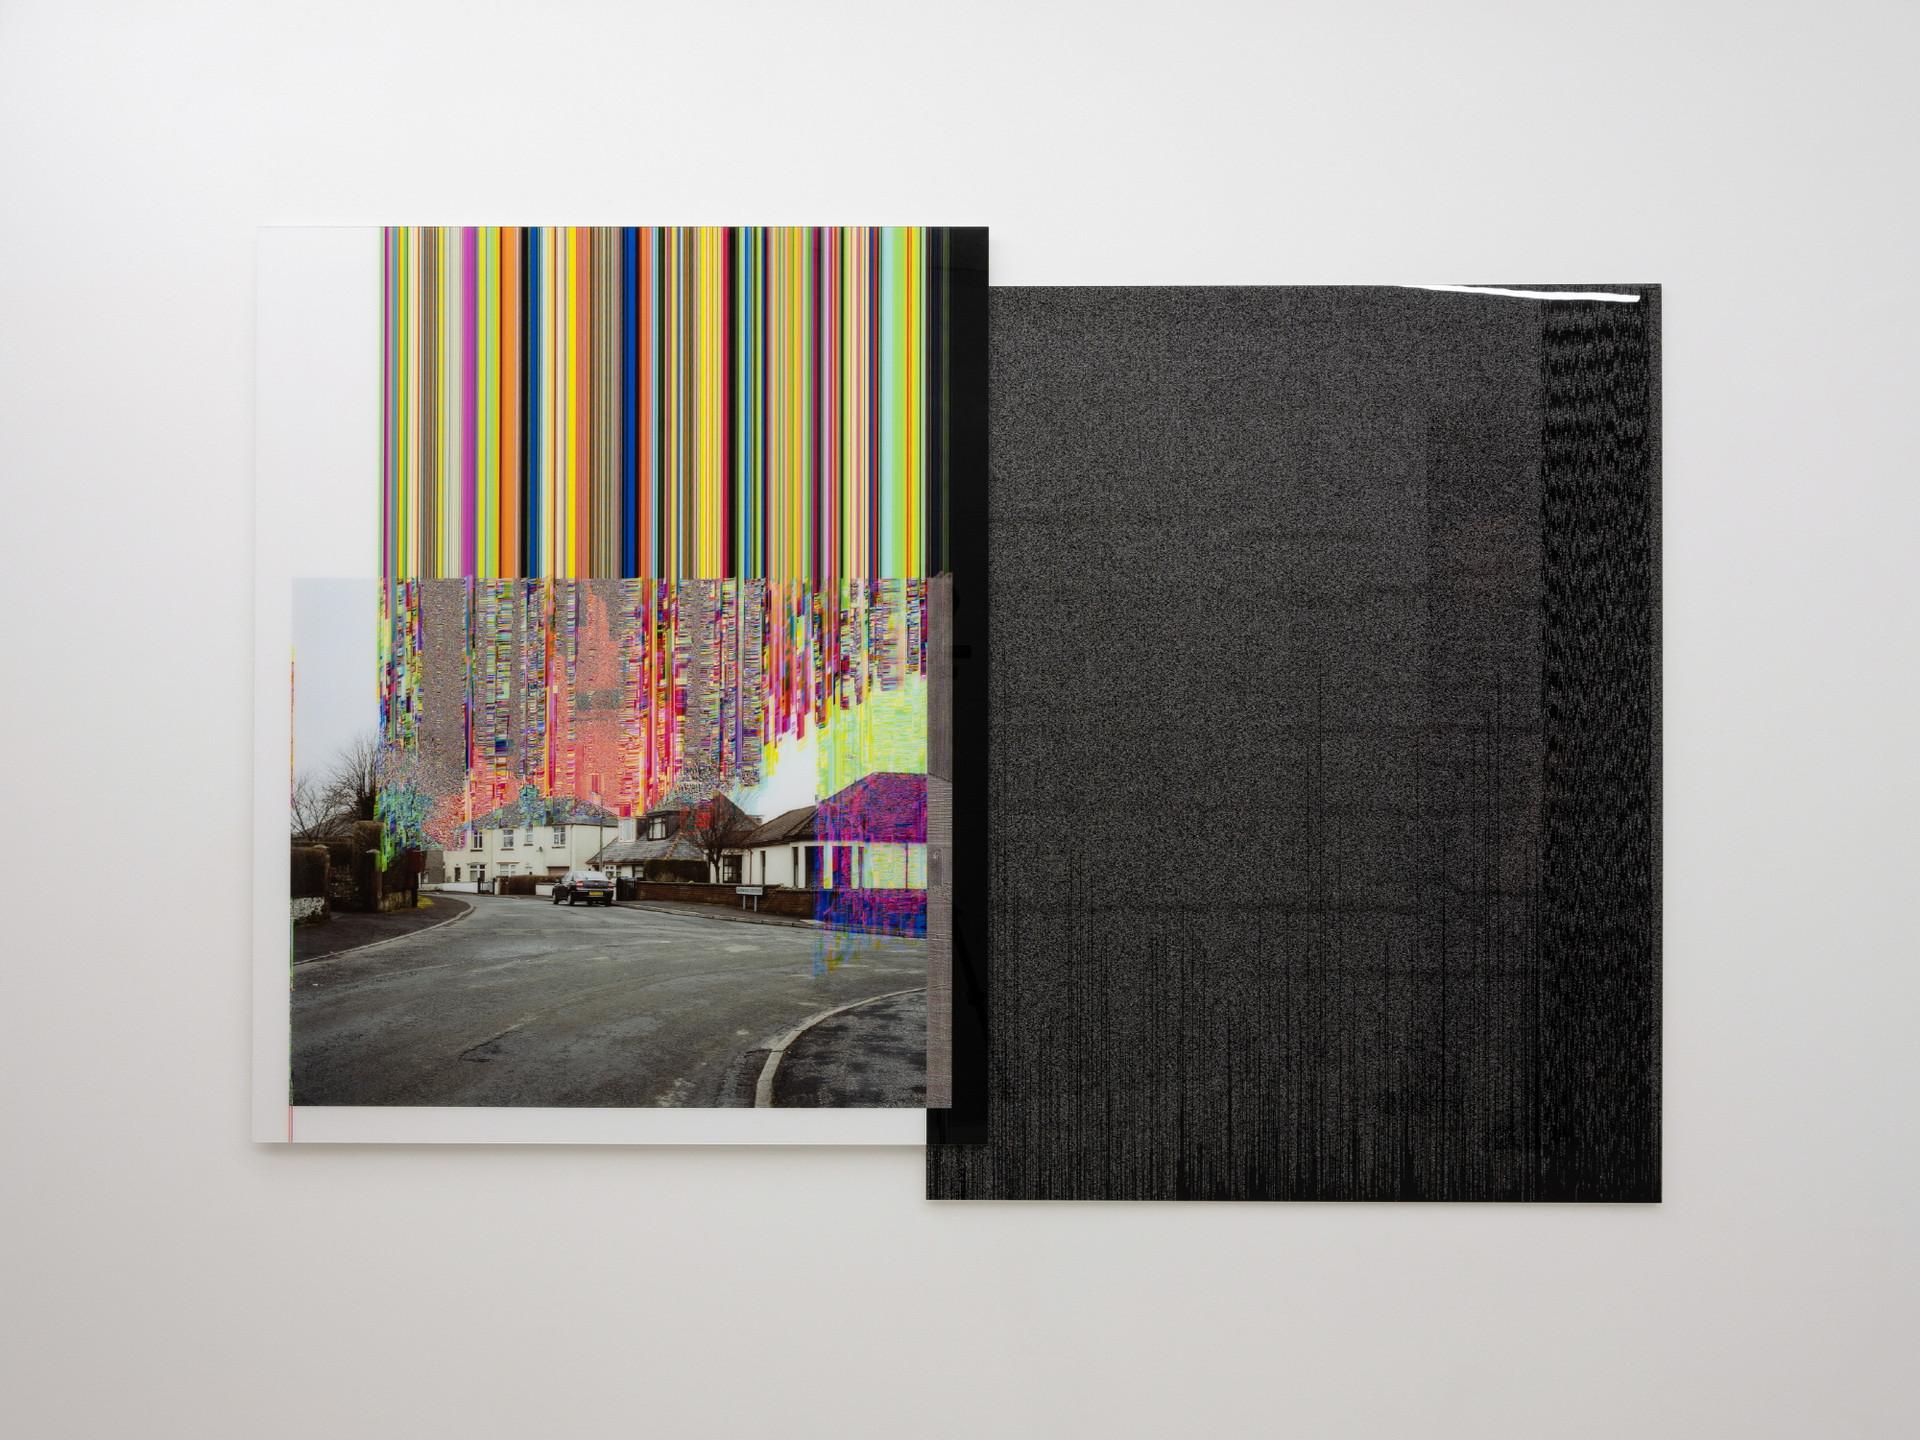 Installation View_픽셀느와르 PIXEL NOIR, 더 레퍼런스, 서울, 2018